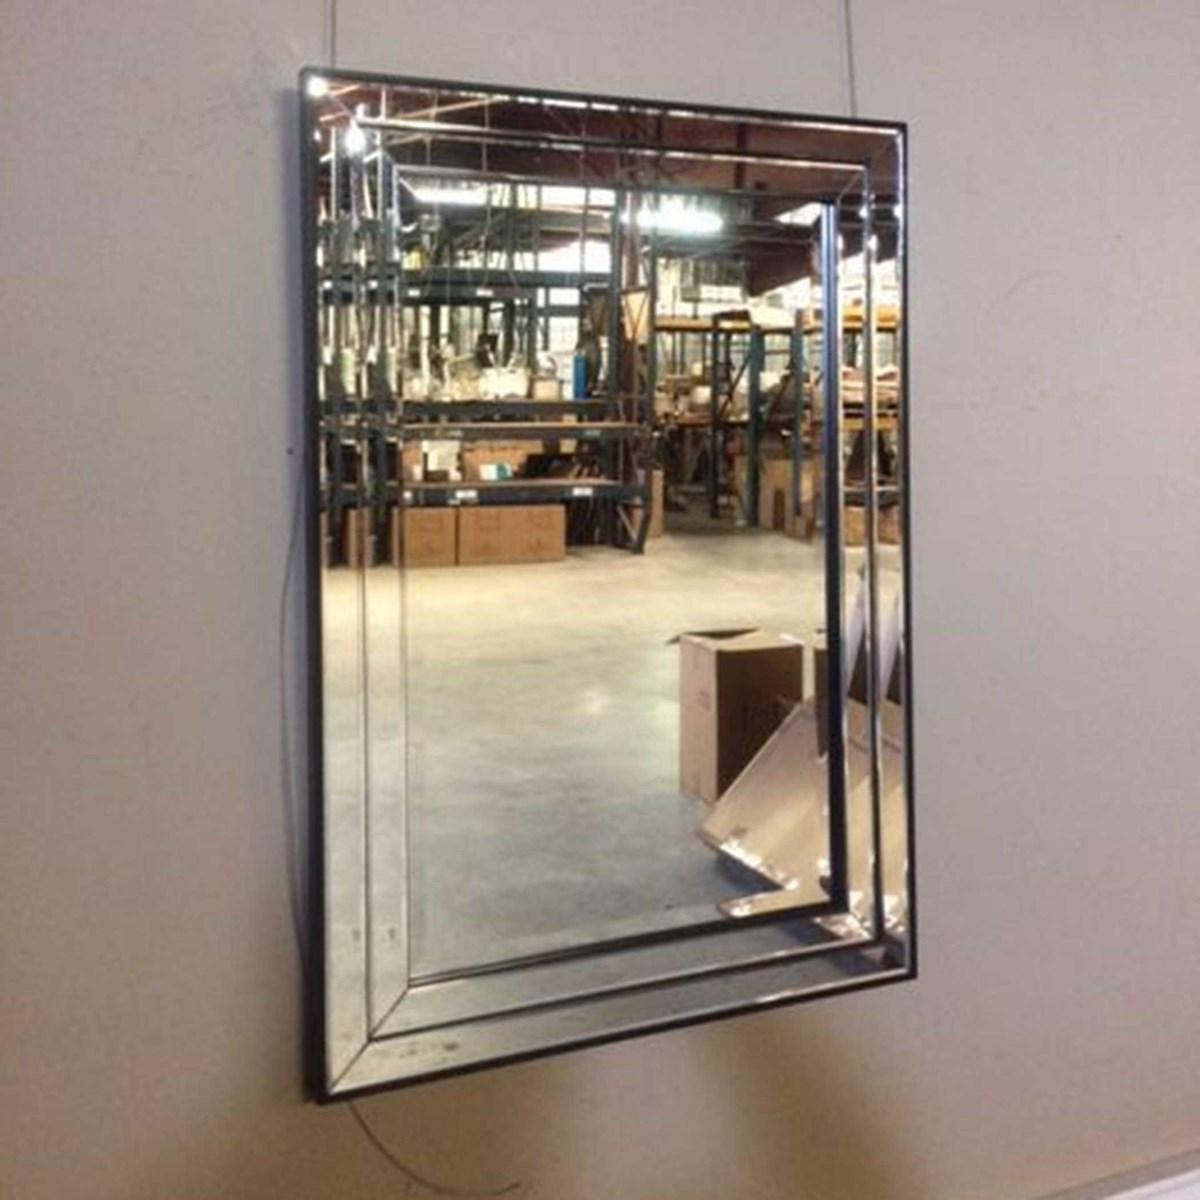 Vivian Wall Mirror By Uttermost: Uttermost Accent Furniture, Mirrors, Wall Decor, Clocks